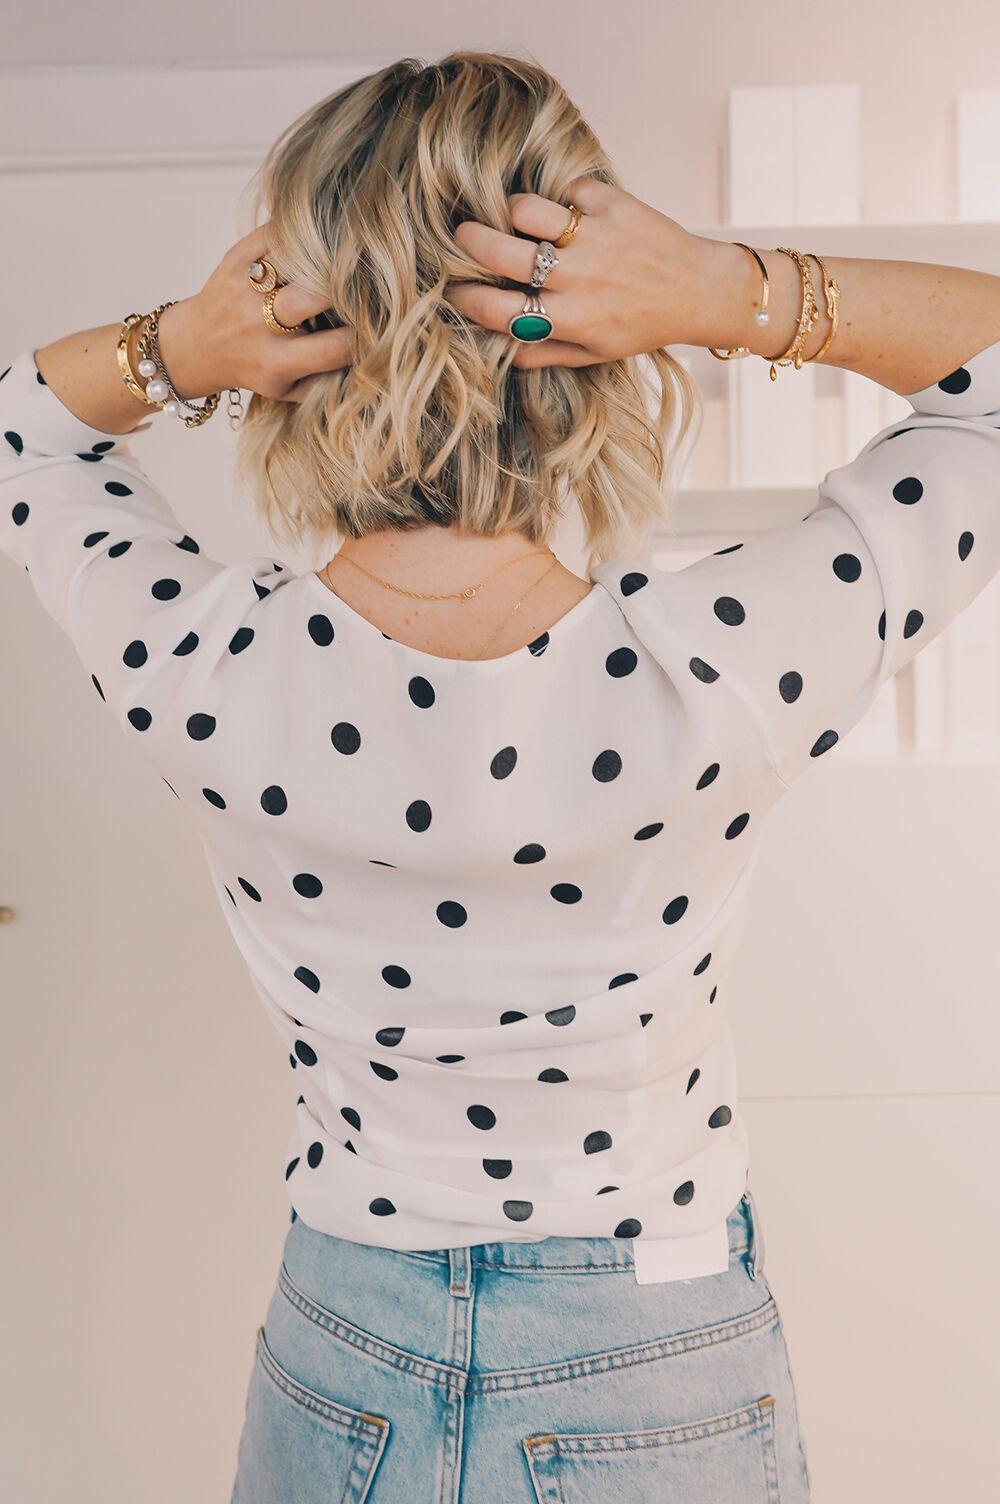 blogg vanja wikström hår kort blond page lockig